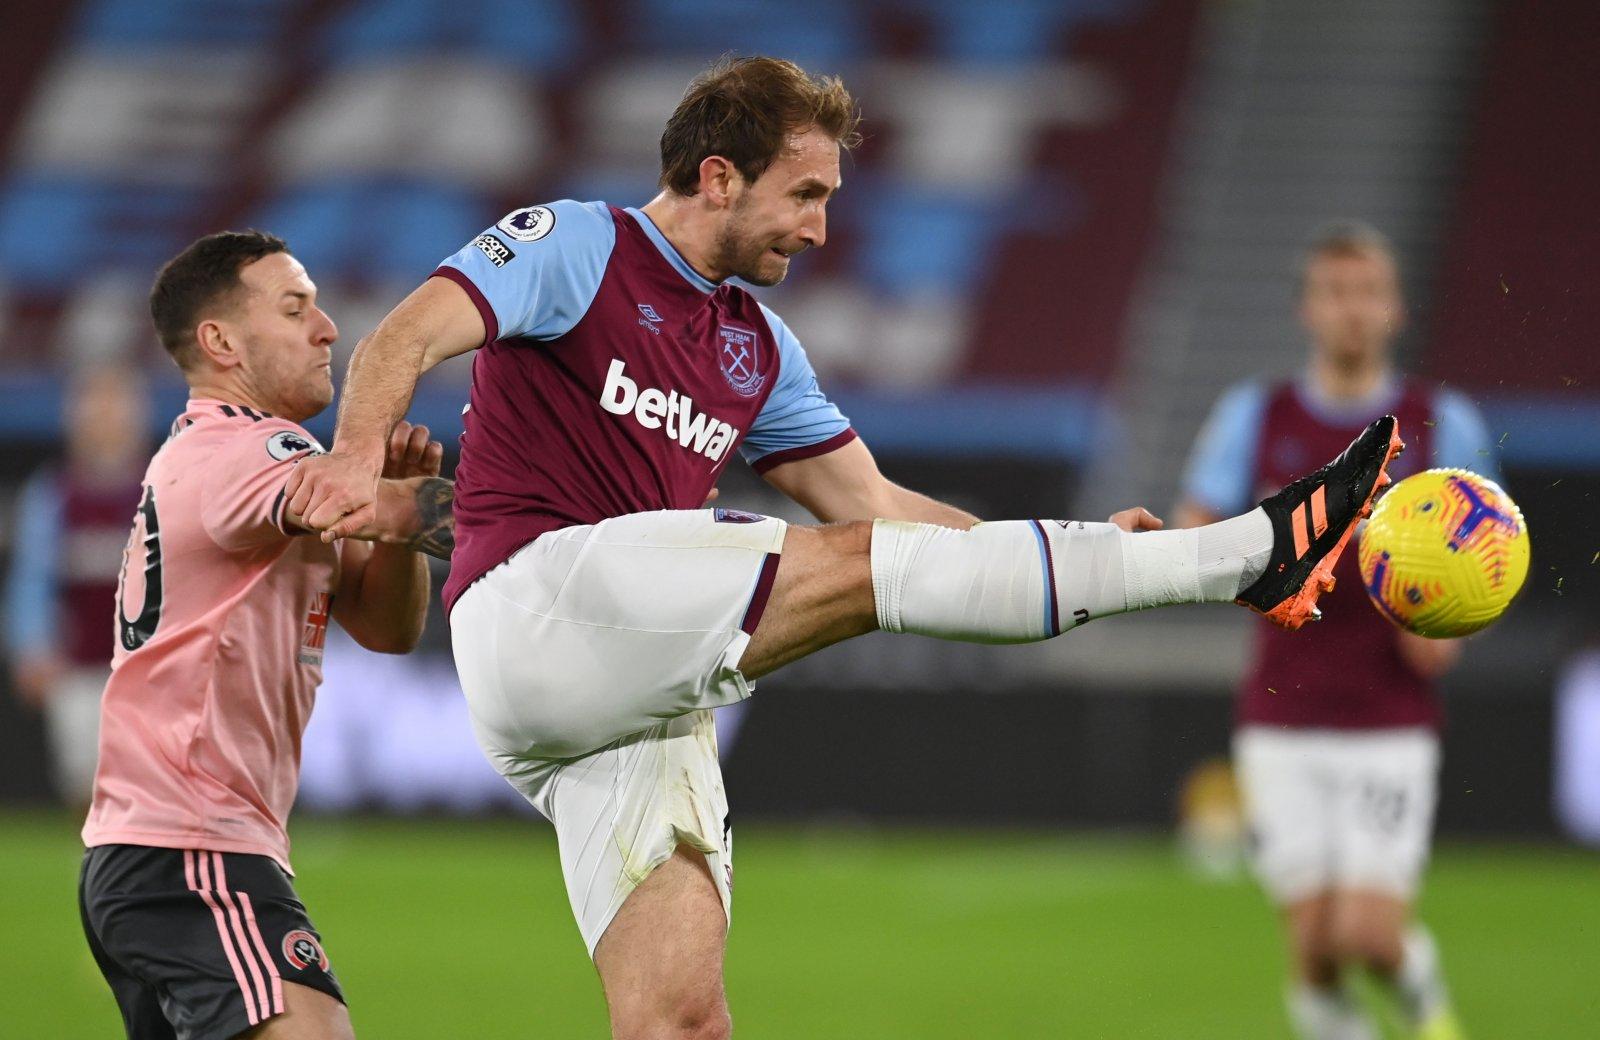 Image for Football fans debate Craig Dawson for England